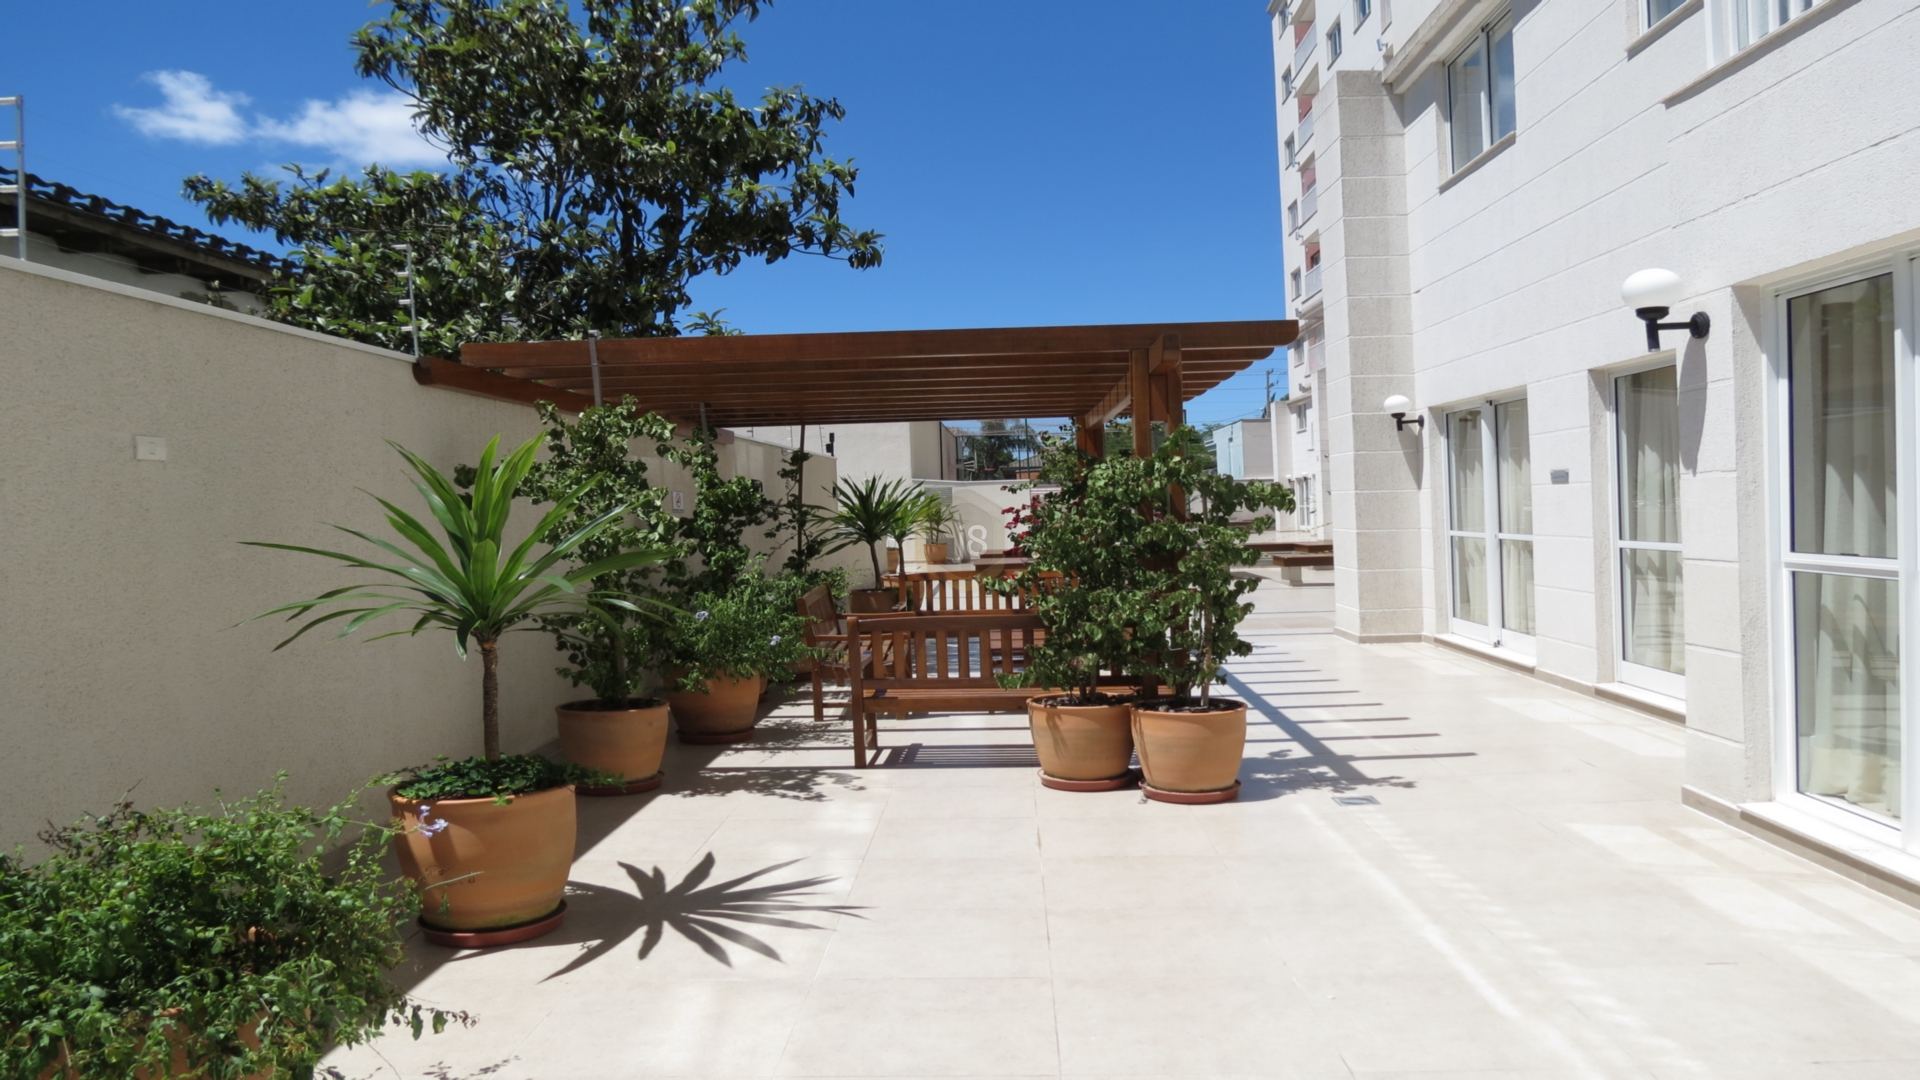 Coberturas de 3 dormitórios em Vila Izabel, Curitiba - PR